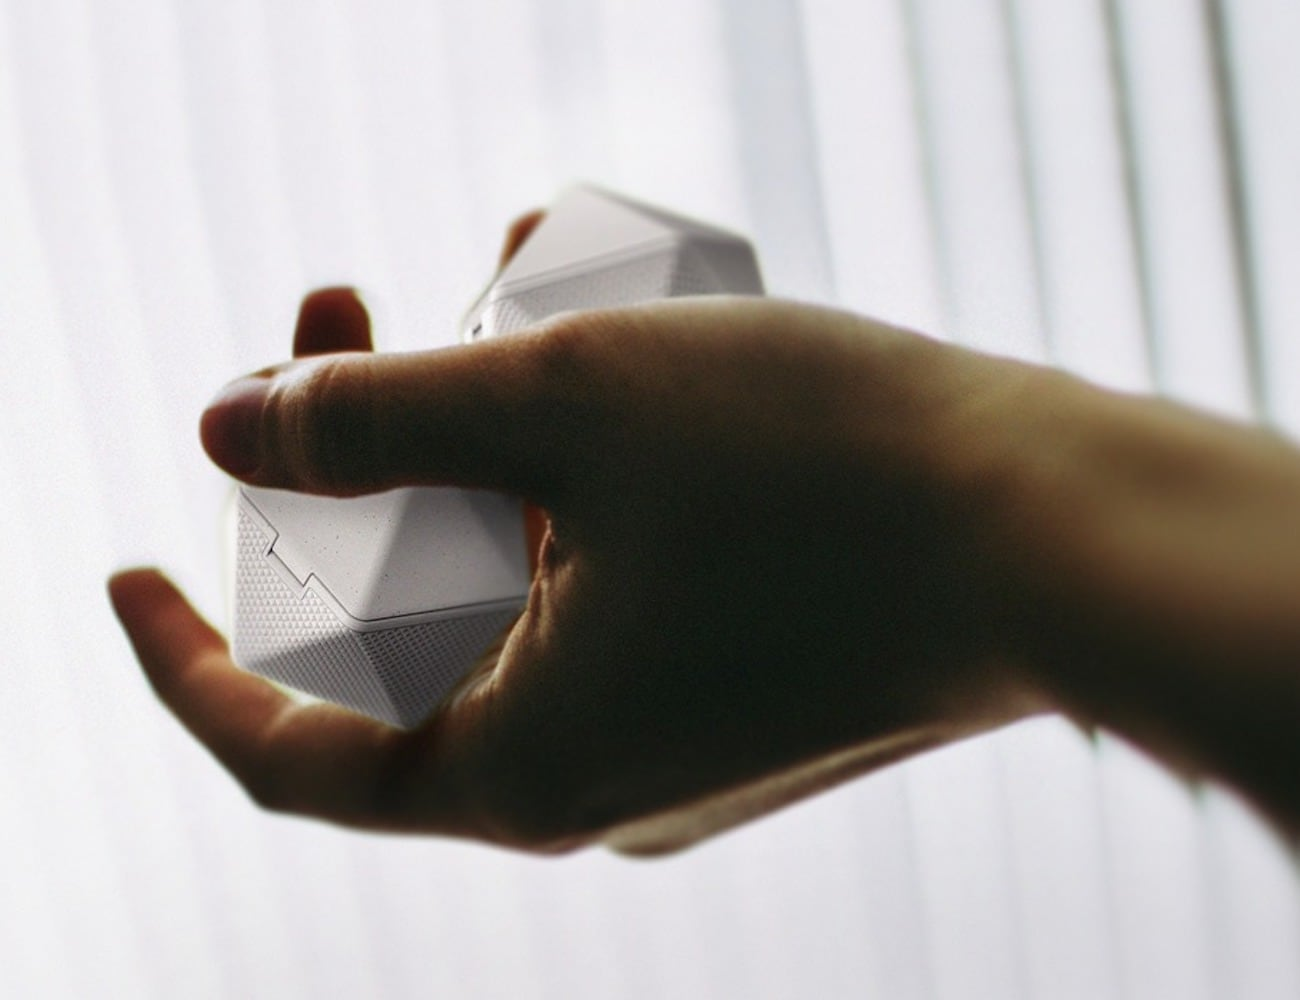 Walnut Personal Health Fidget Toy monitors blood sugar levels